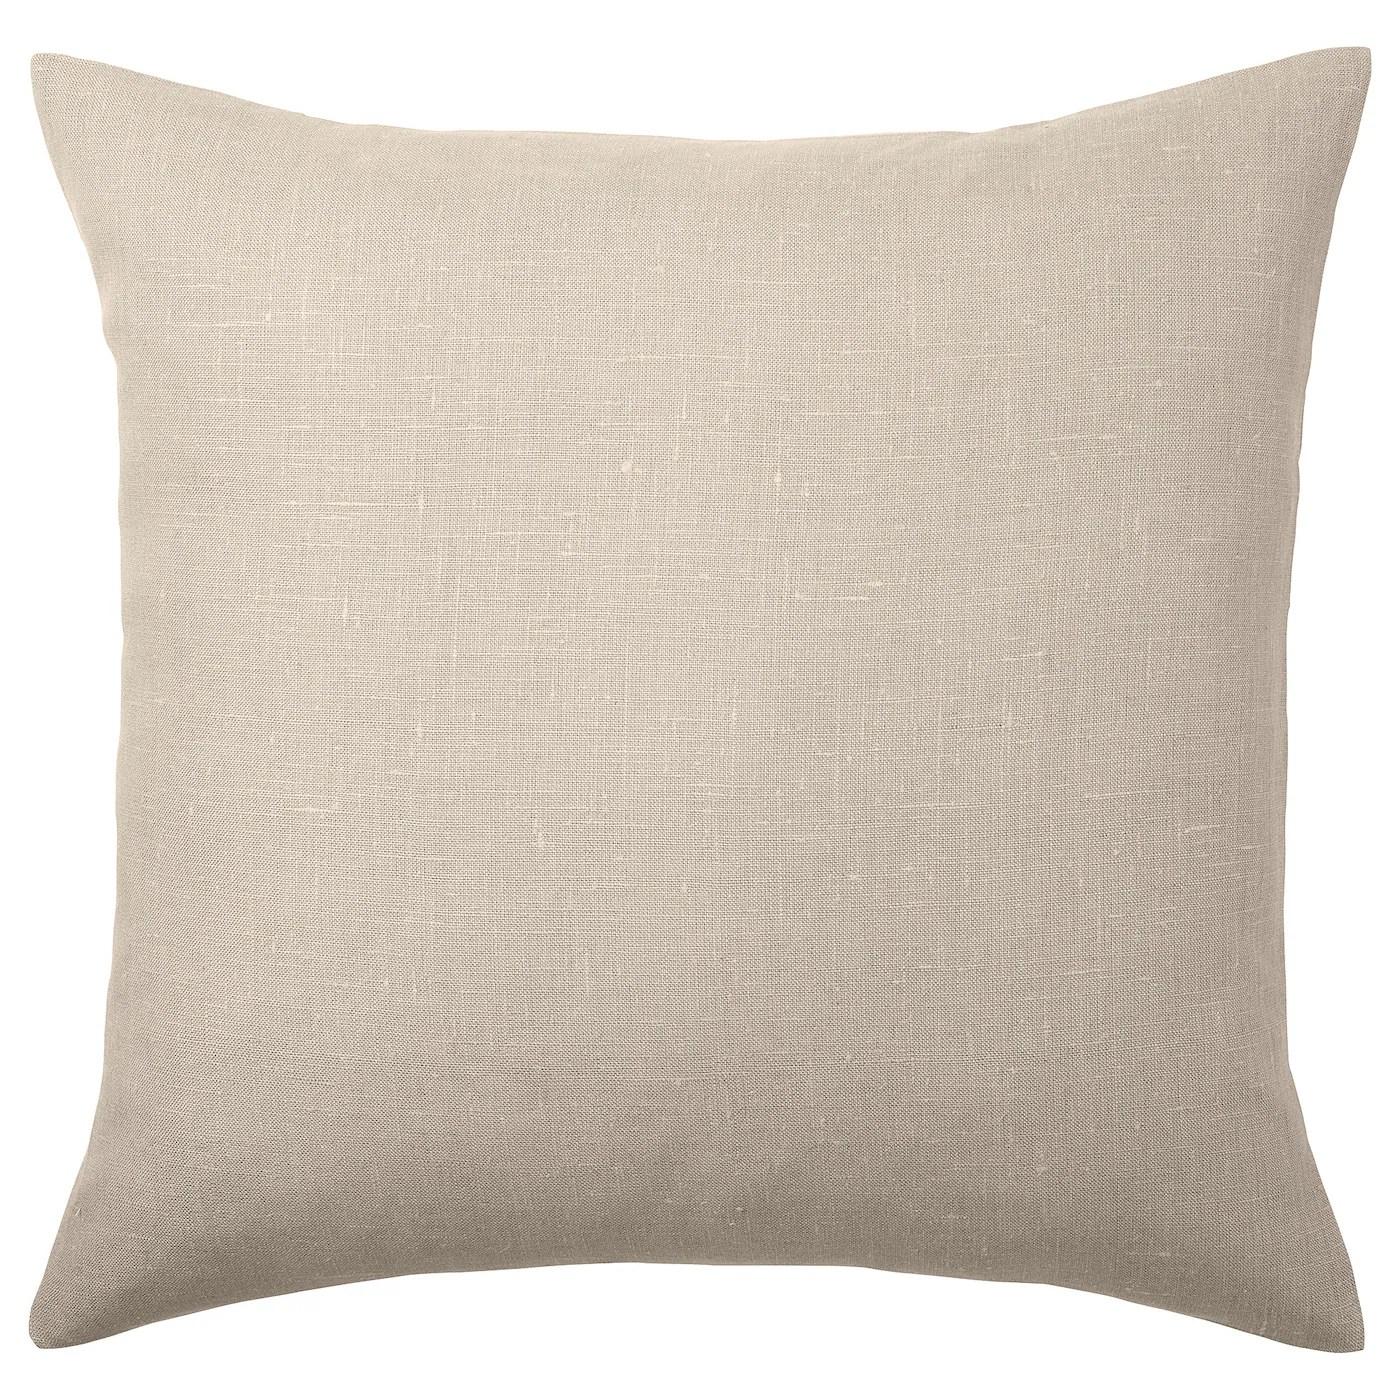 aina cushion cover beige 20x20